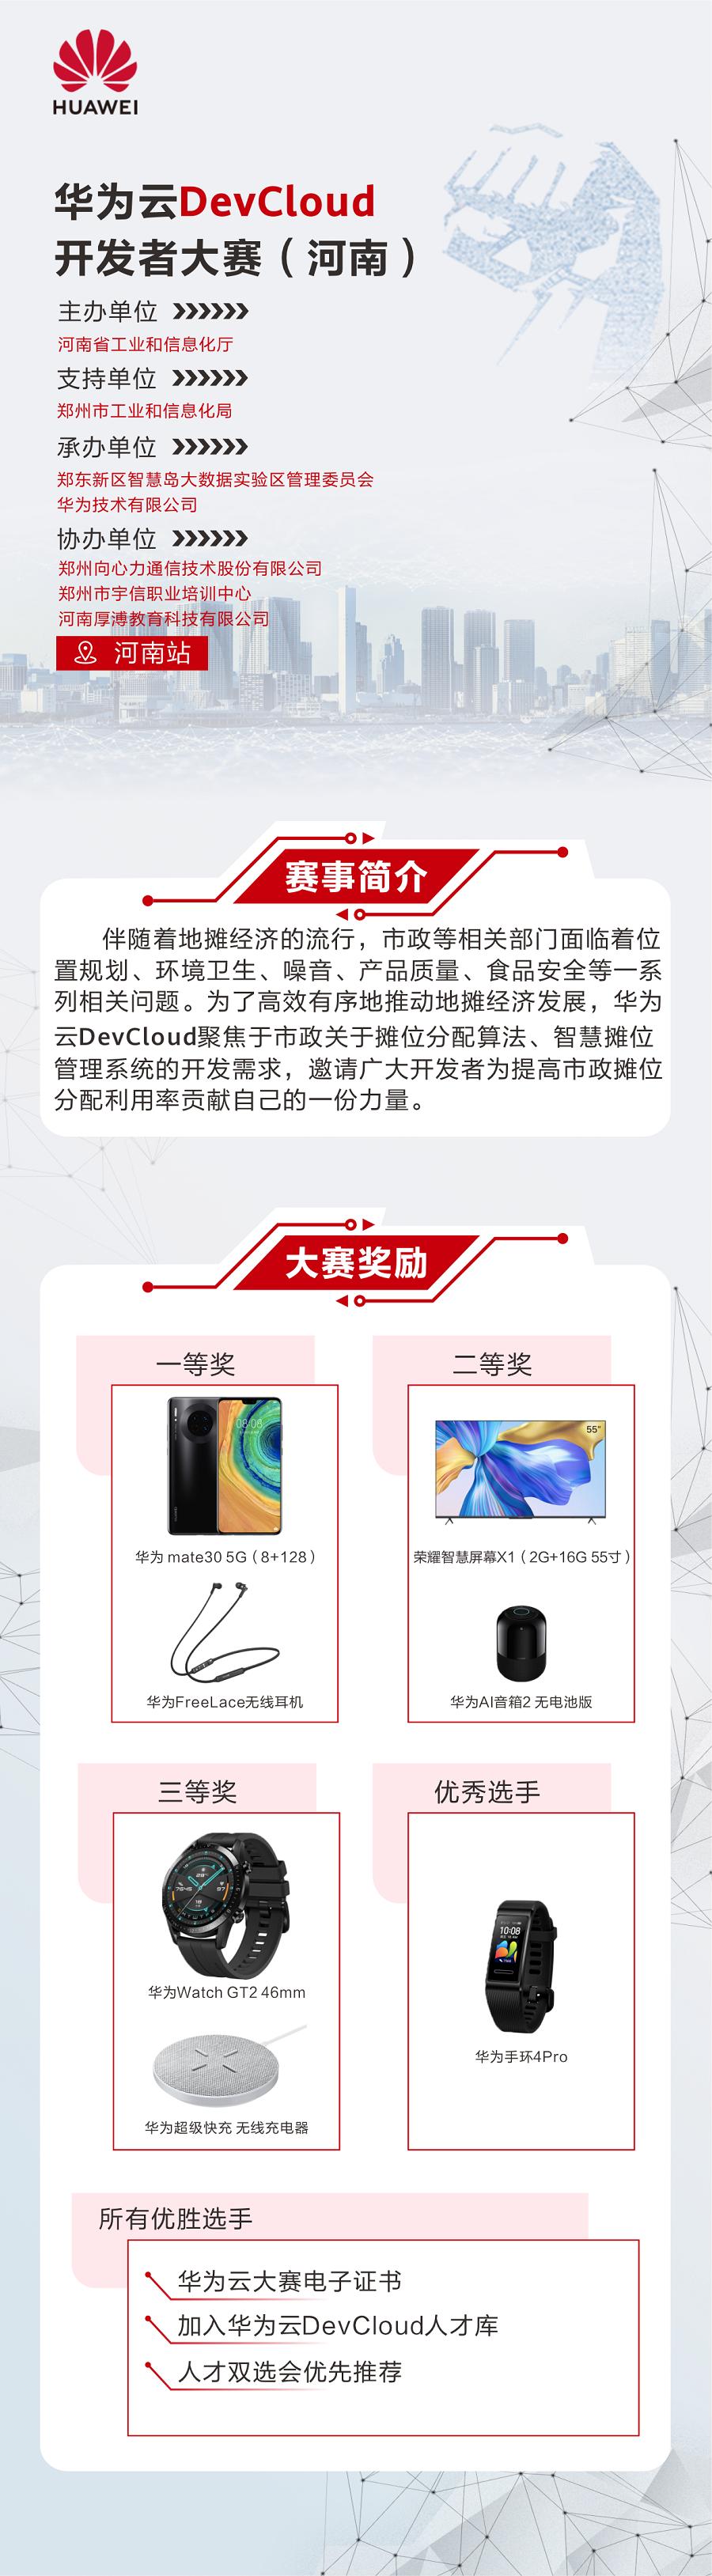 http://www.reviewcode.cn/qukuailian/157630.html